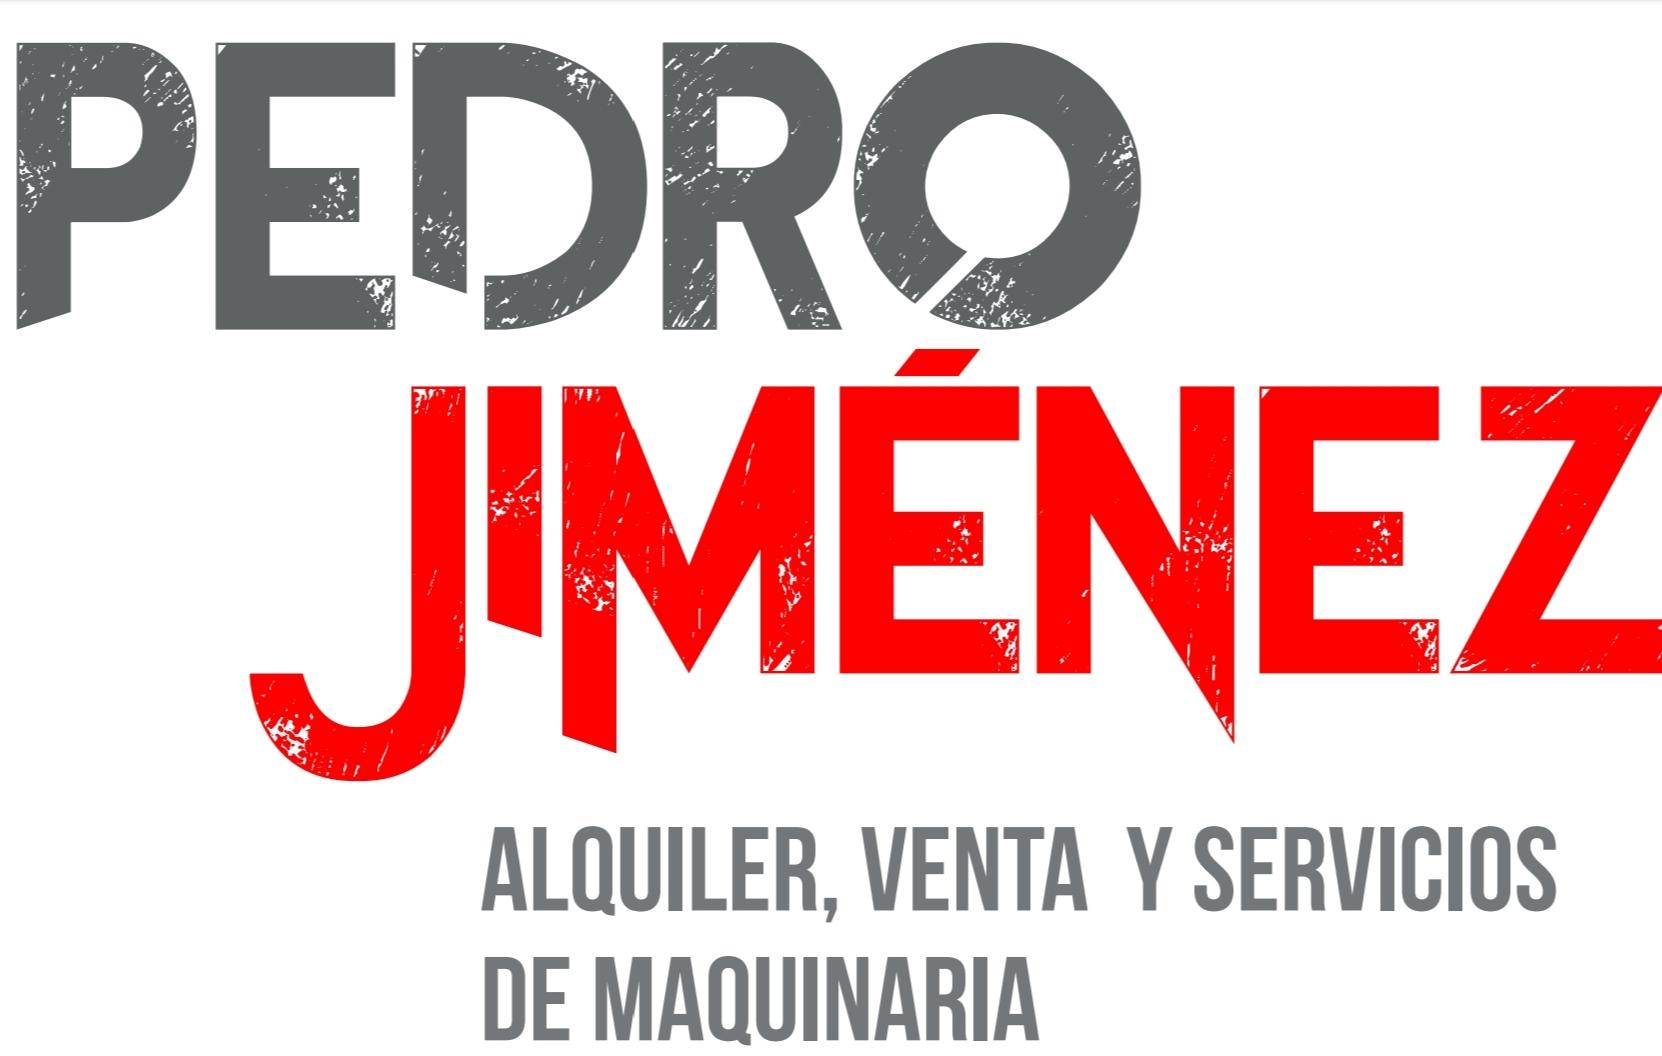 Pedro Jiménez Burruezo S.L.